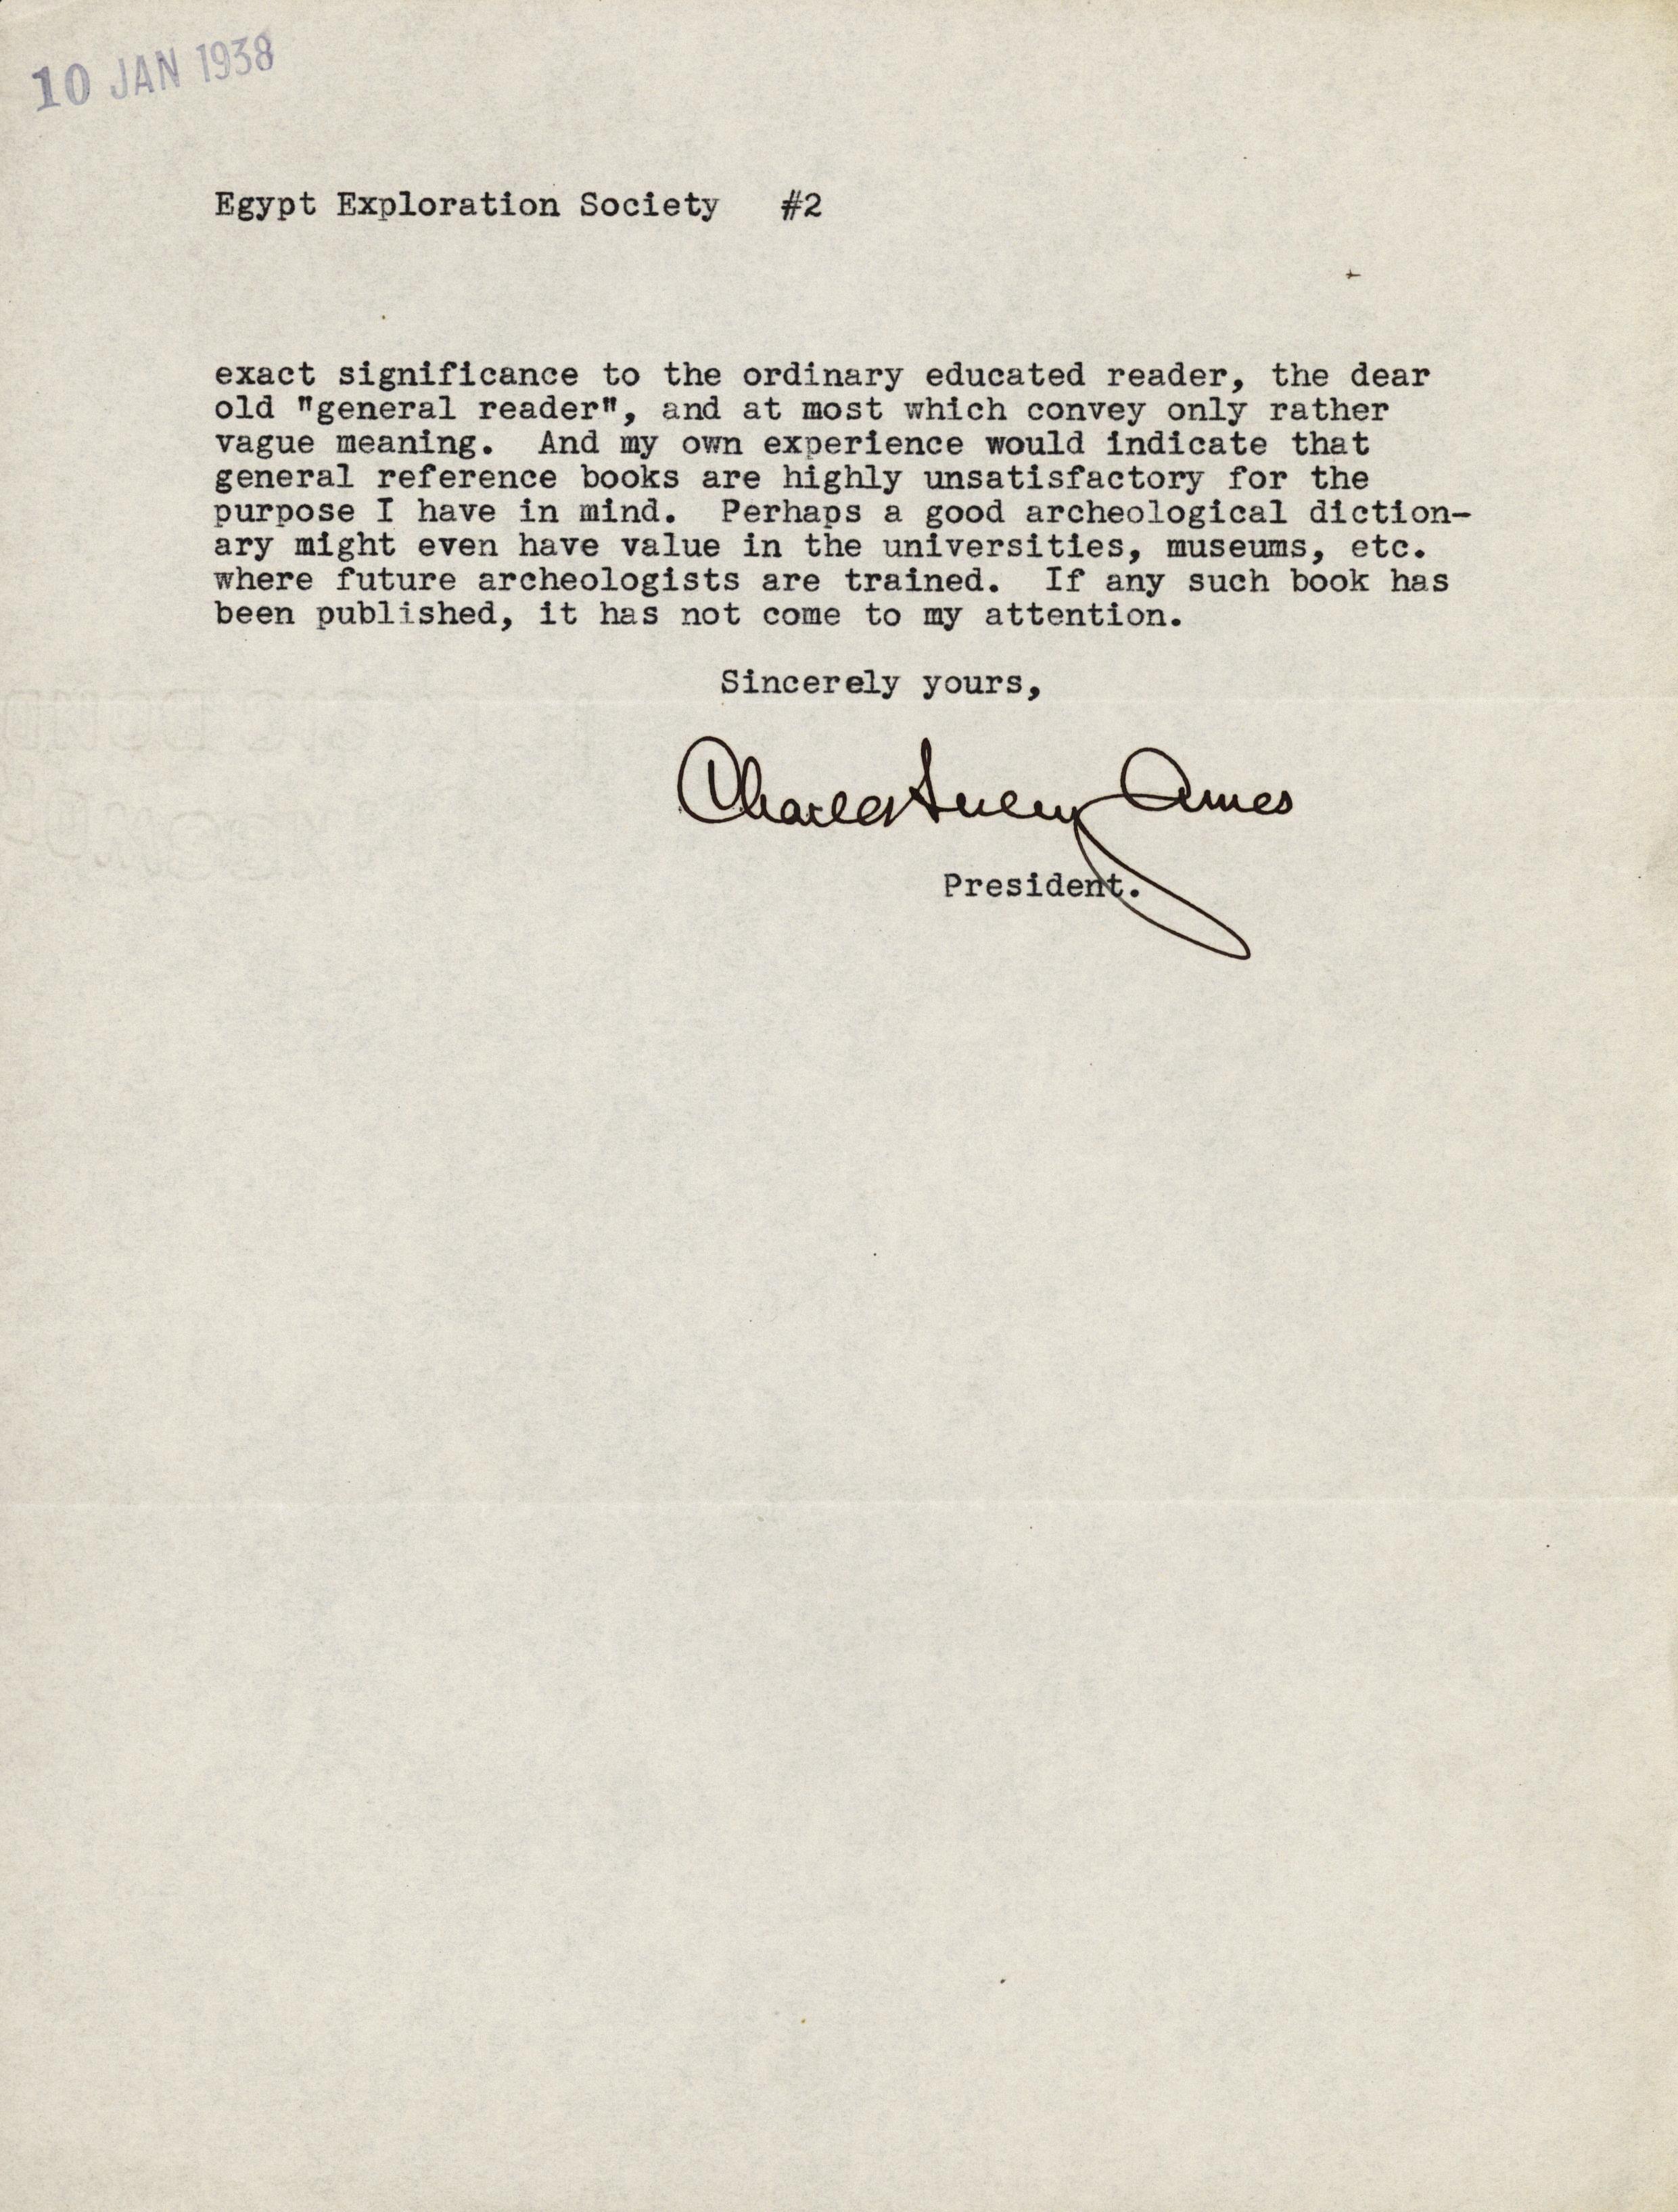 1936-38 Amarah West, Sesebi DIST.62.12b